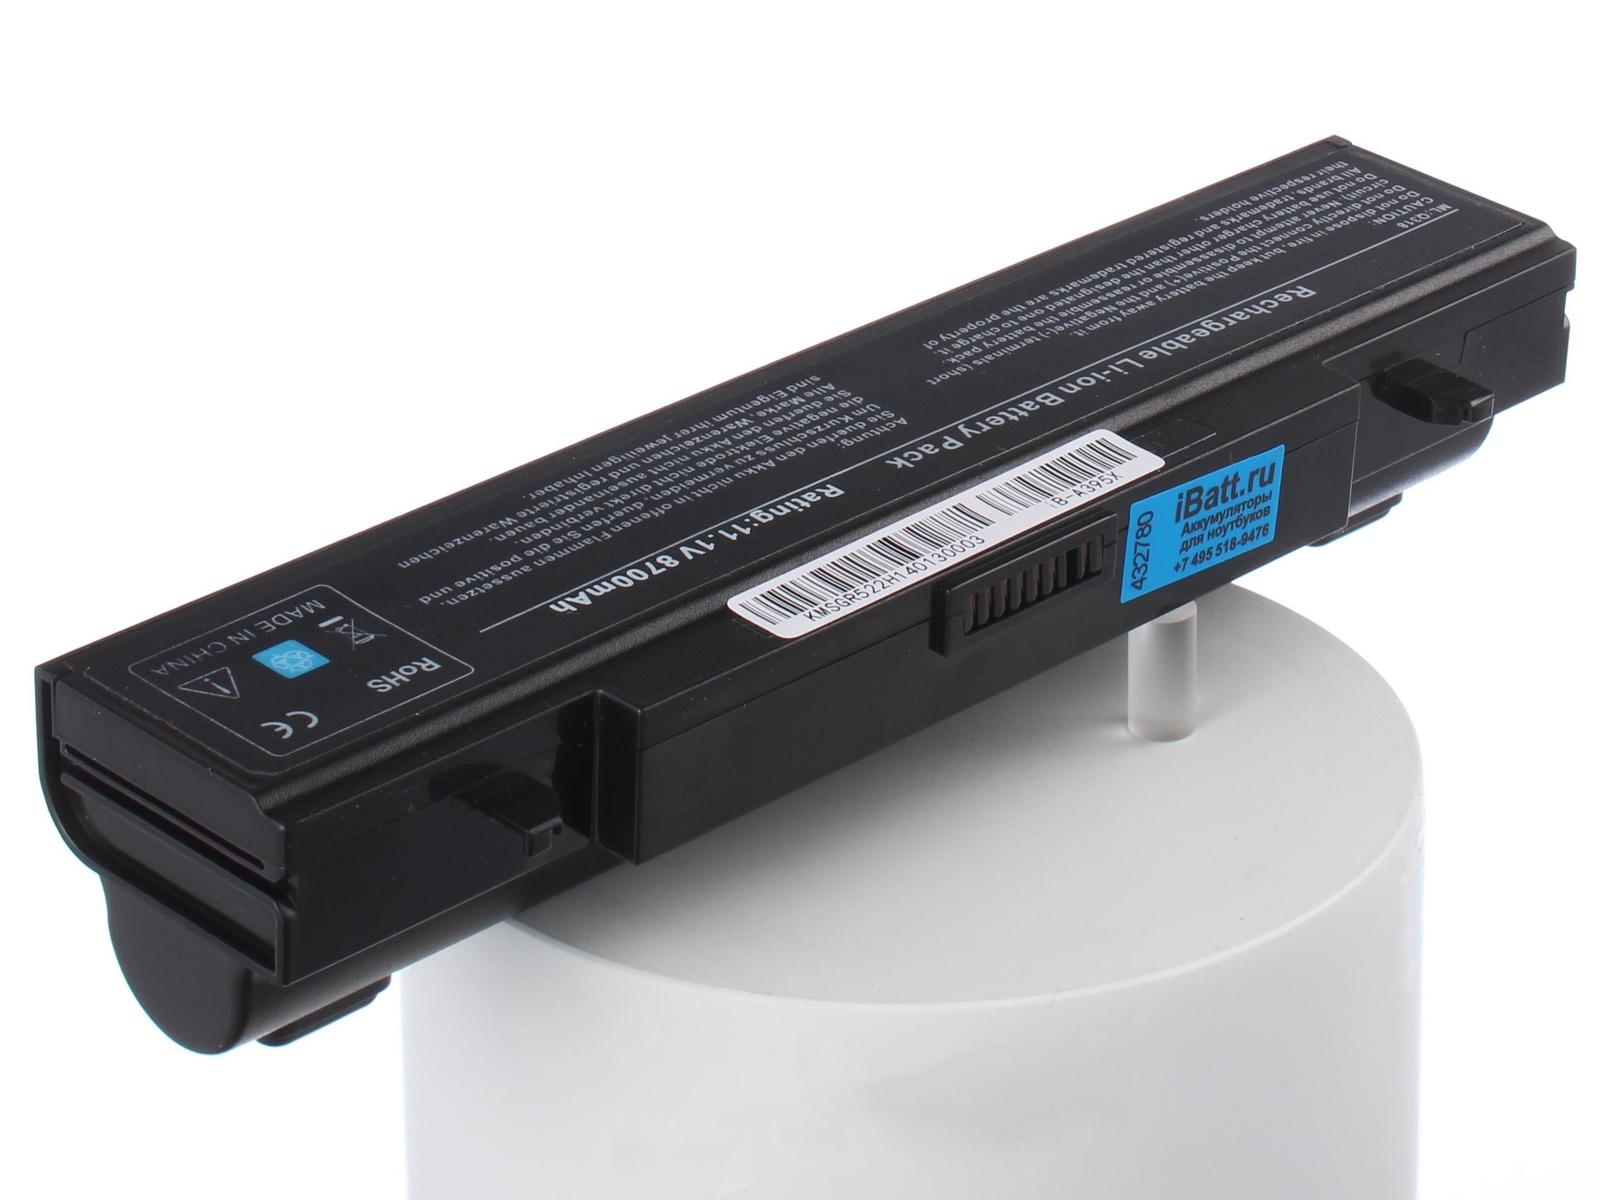 Аккумулятор для ноутбука iBatt для Samsung RV711-A01, 300E5X-U02, 300V5A-S0E, 305V5A-T09, 310E5C-U05, 350E7C-A04, R430-JA01, R780-JS02, RF712-S01, 300E5C-A0E, 300E5Z-S01, NP270E5E-K02, R469-JS01, R525-JT05, R540-JS01, R580-JS04 honghay aa pb9nc6b laptop battery for samsung pb9ns6b pb9nc6b r580 q460 r468 r525 r429 300e4a rv511 r528 rv420 rv508 355v5c r428